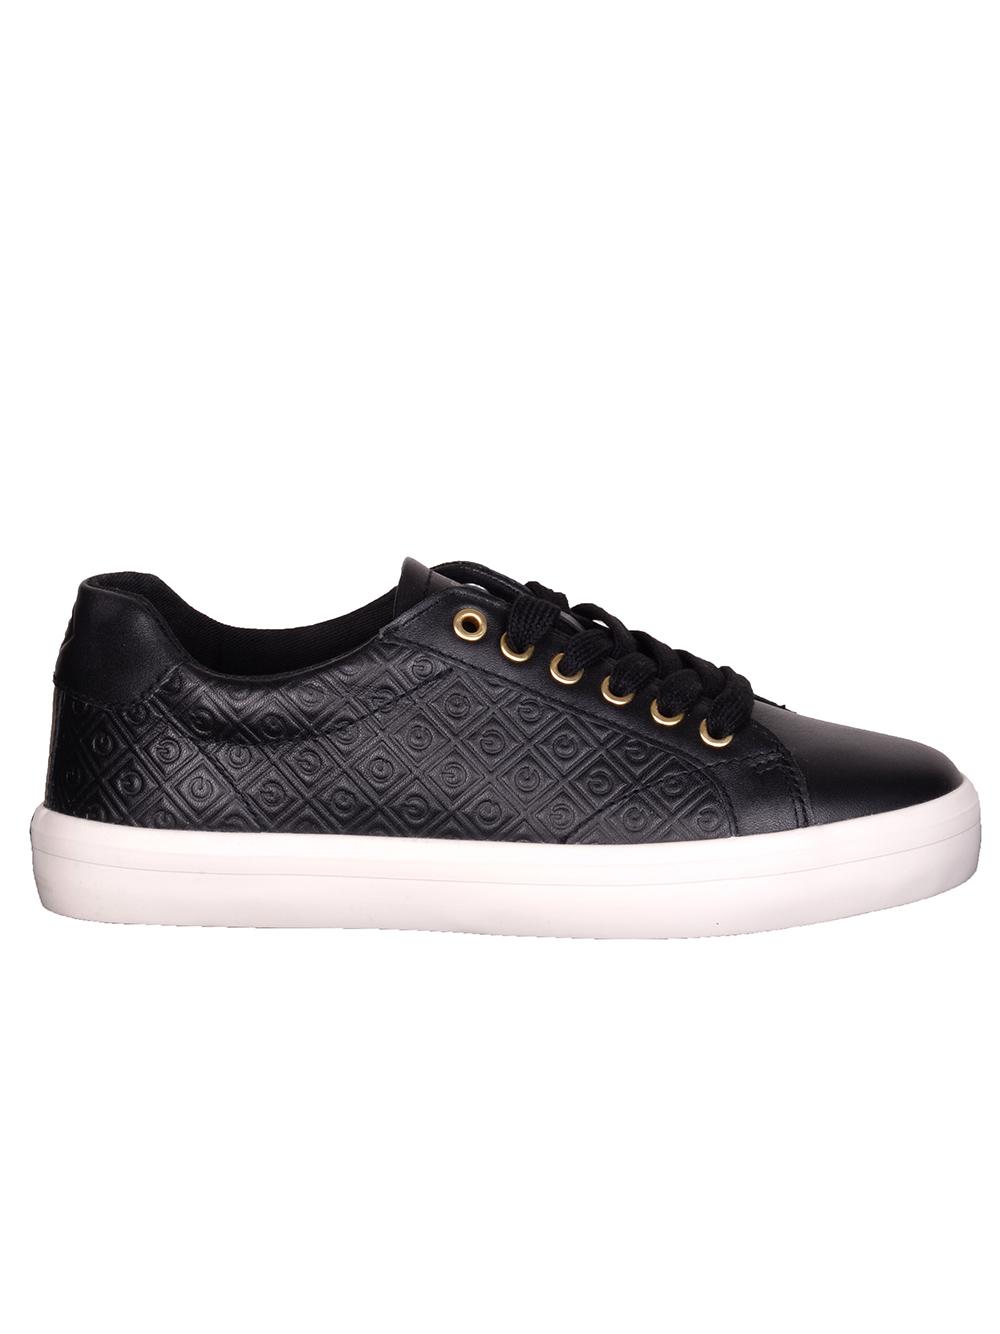 GANT Παπούτσια sneakers 3GS22531586-0 ΜΑΥΡΟ